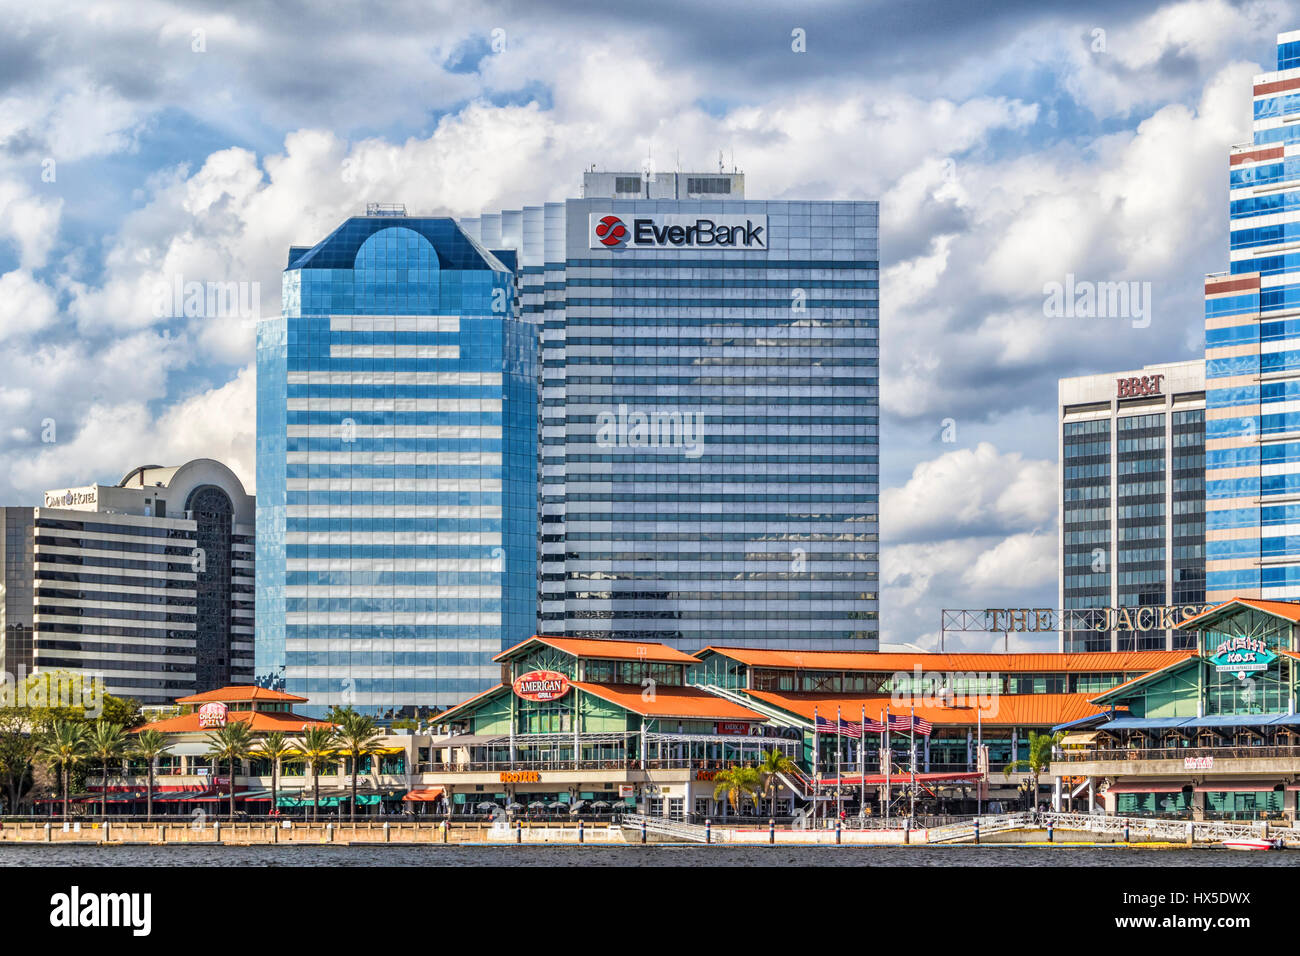 Jacksonville Landing, upscale downtown shopping and restaurant center in Jacksonville, Florida. - Stock Image